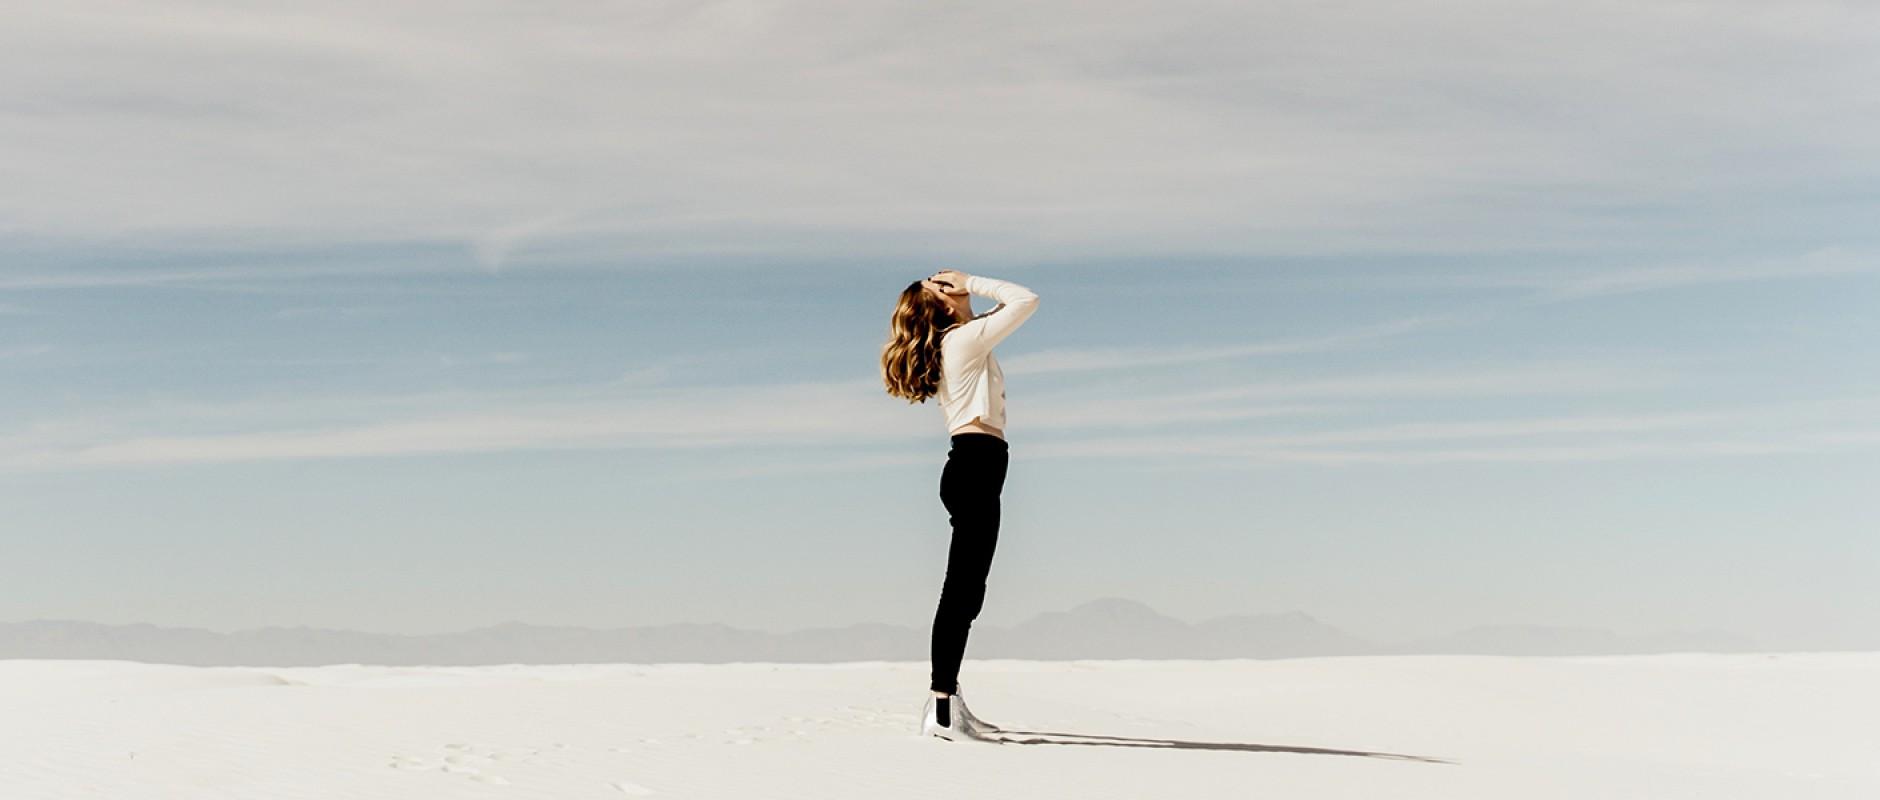 leefstijl holistisch voeding beweging ontspanning mindset